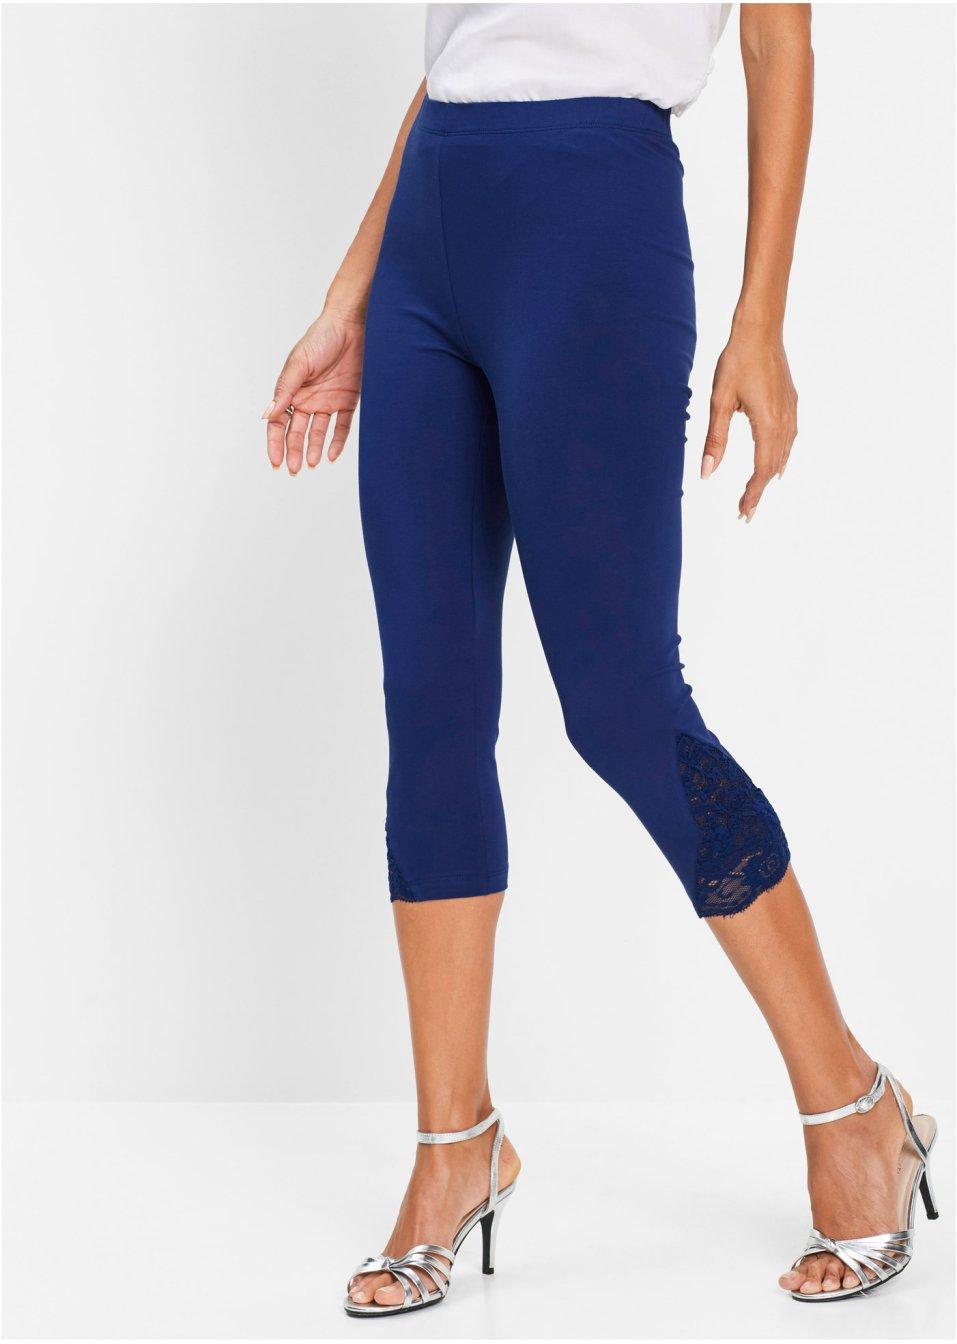 ansprechende capri leggings mit spitze mitternachtsblau. Black Bedroom Furniture Sets. Home Design Ideas